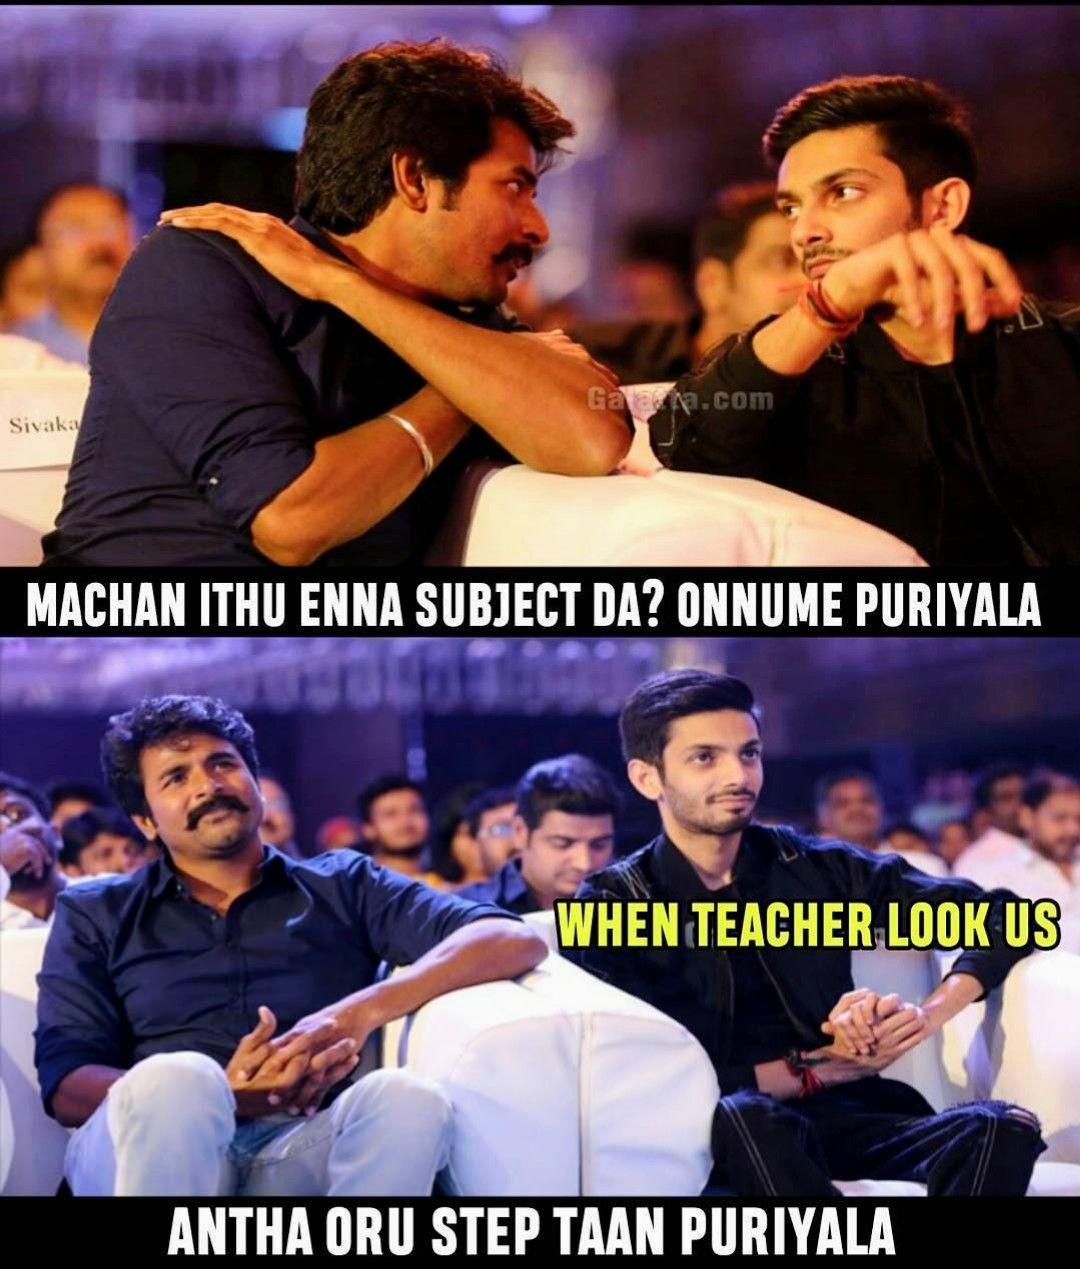 Pin By Sagara On Factu Factu Short Jokes Funny Jokes For Teens Funny School Memes